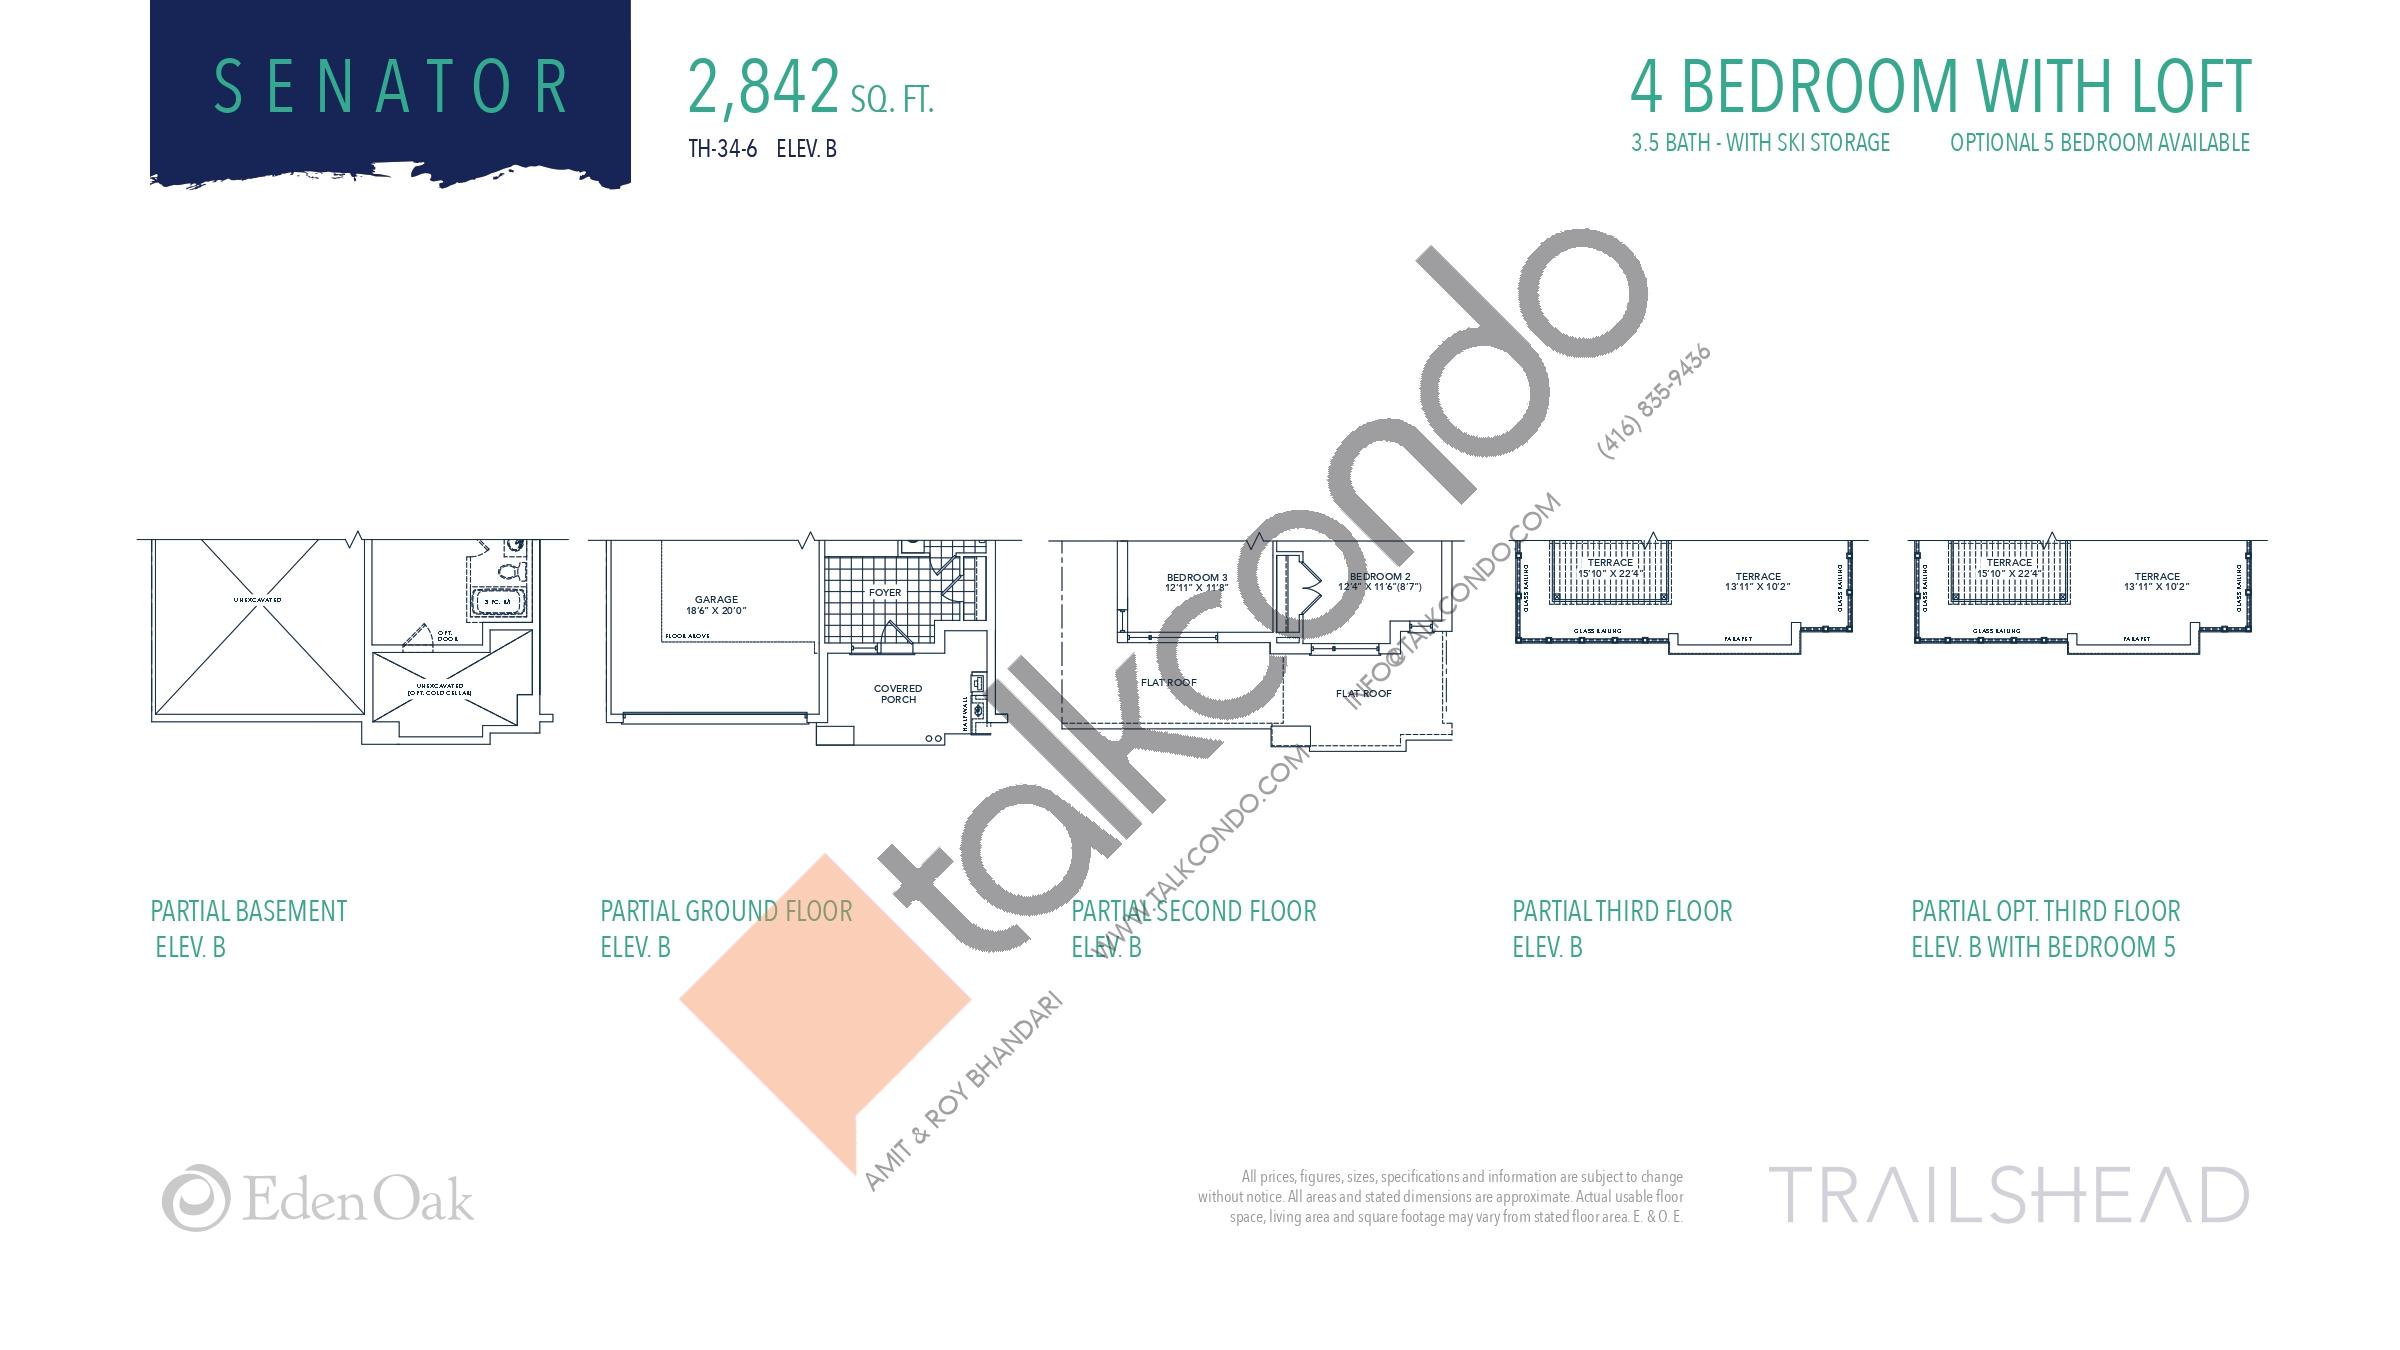 Senator (2/2) Floor Plan at Trailshead Towns - 2842 sq.ft